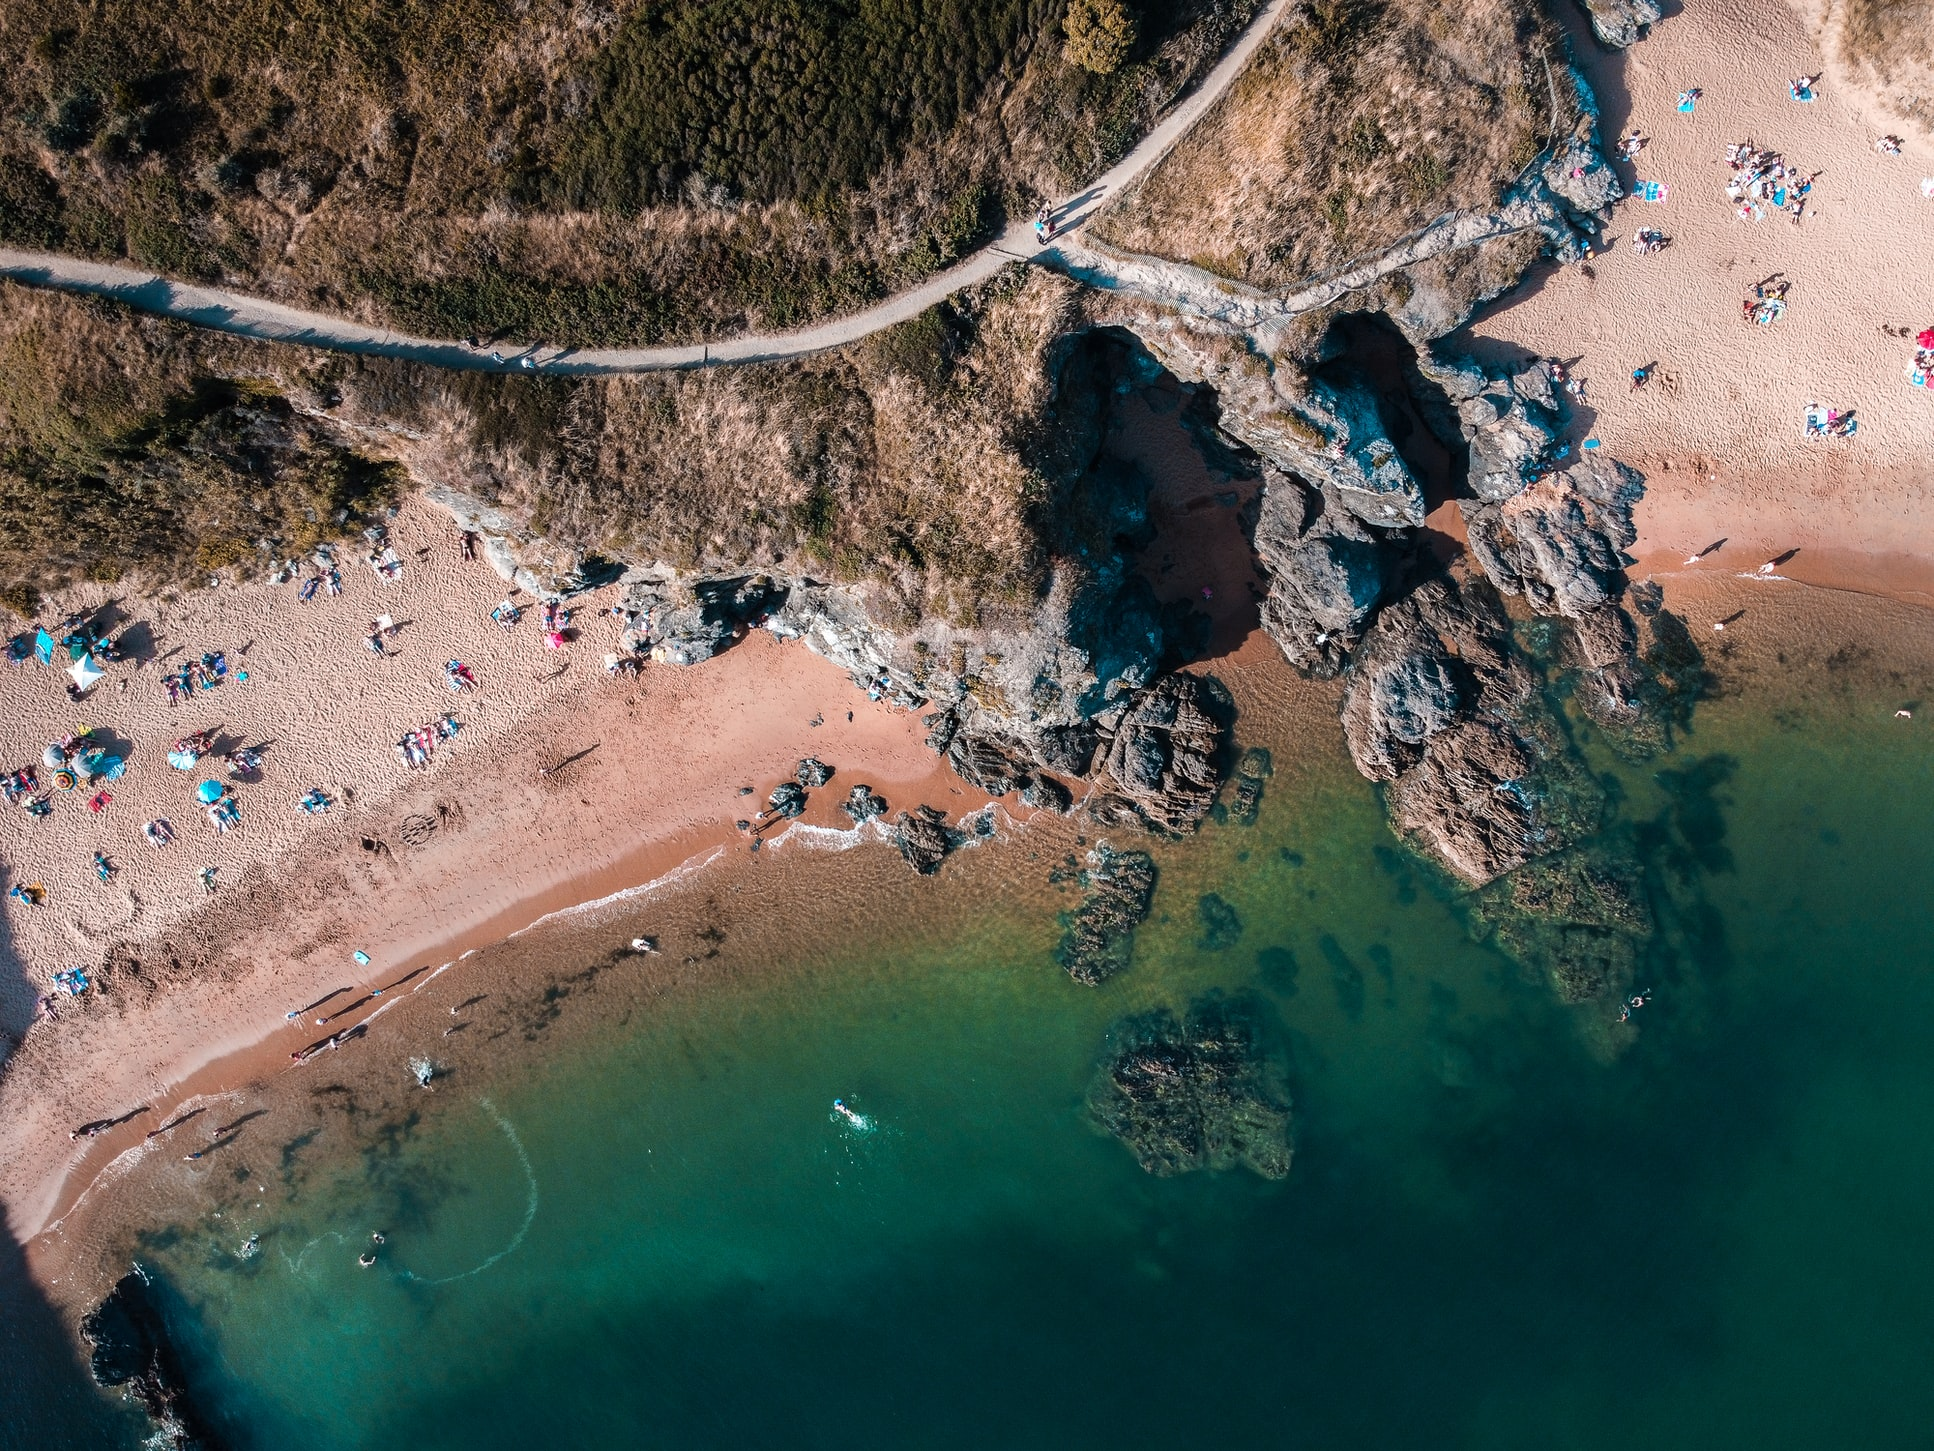 Seaside. Photo credit: Simon Pallard.